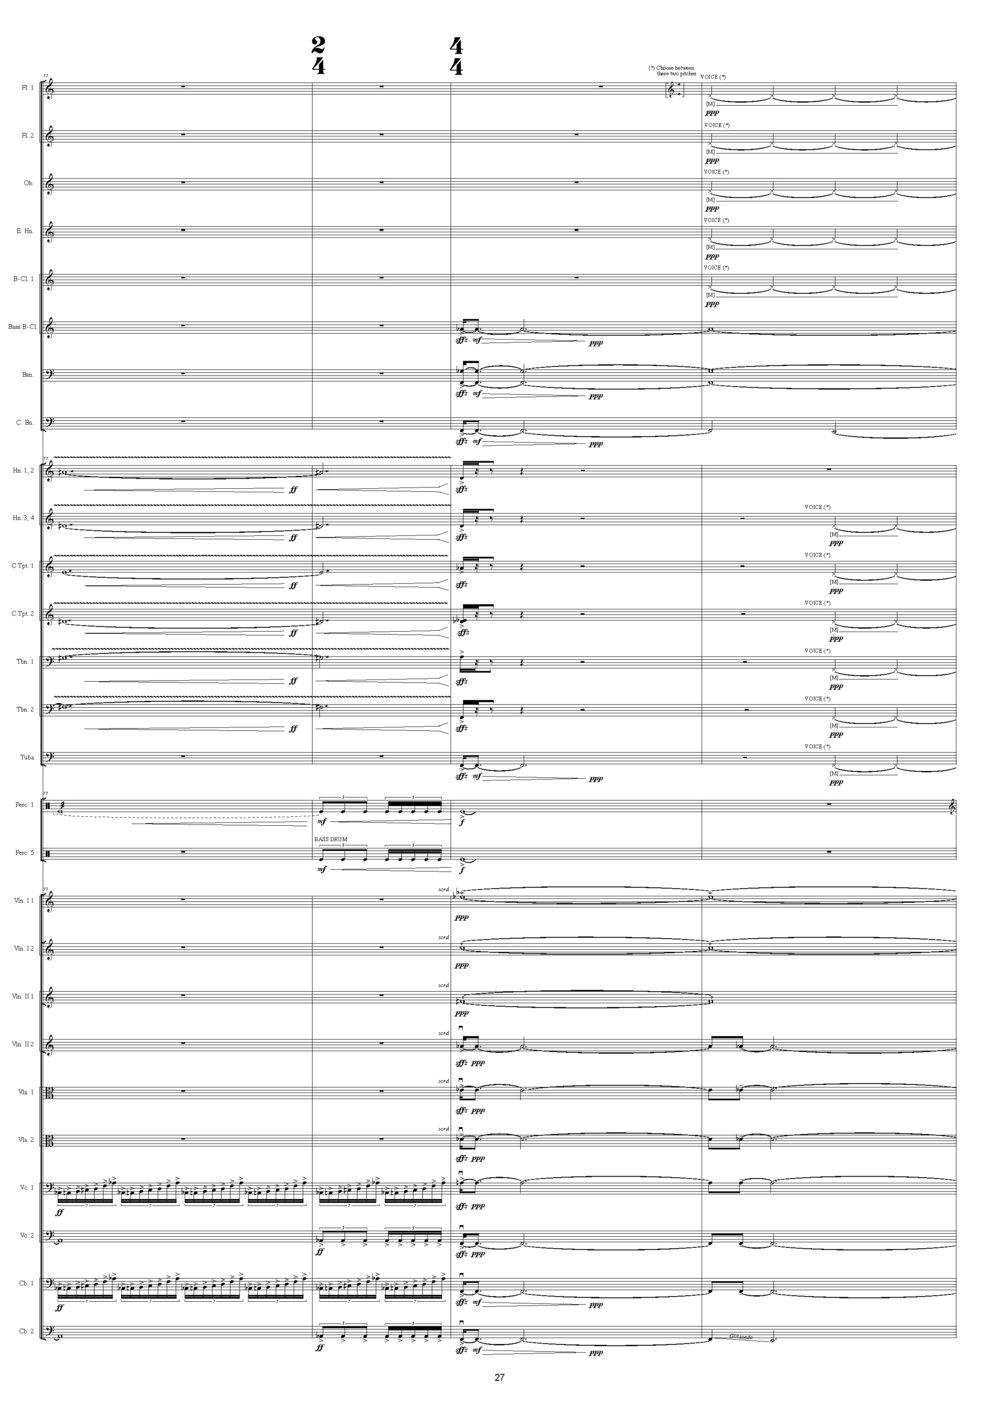 METANOIA_2009-RAPPOPORT_Seite_27.jpg